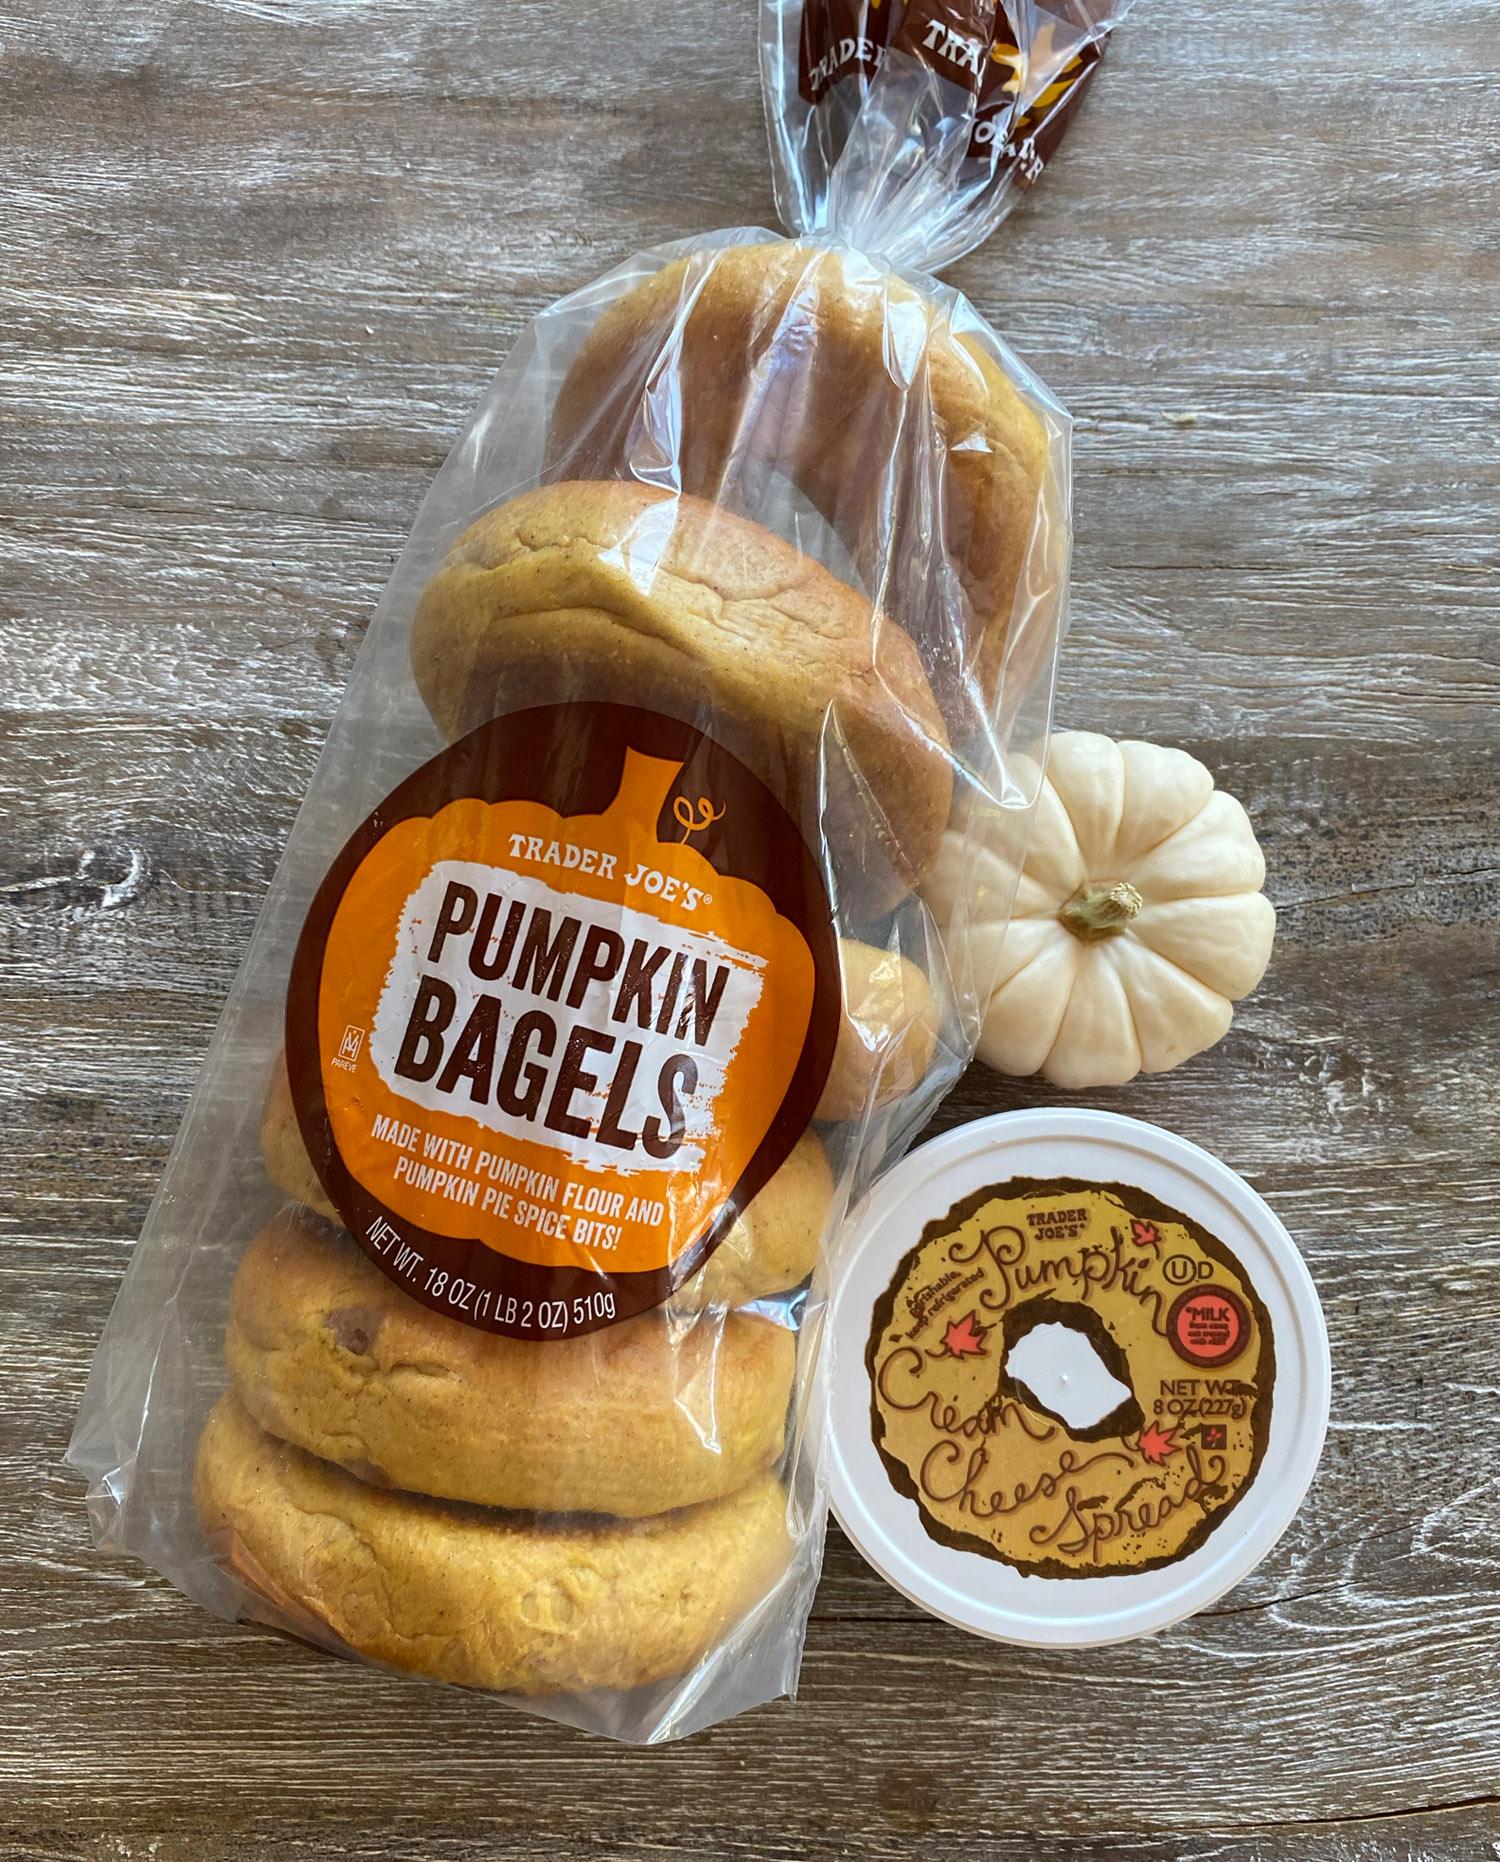 Trader Joe's pumpkin bagels with pumpkin cream cheese